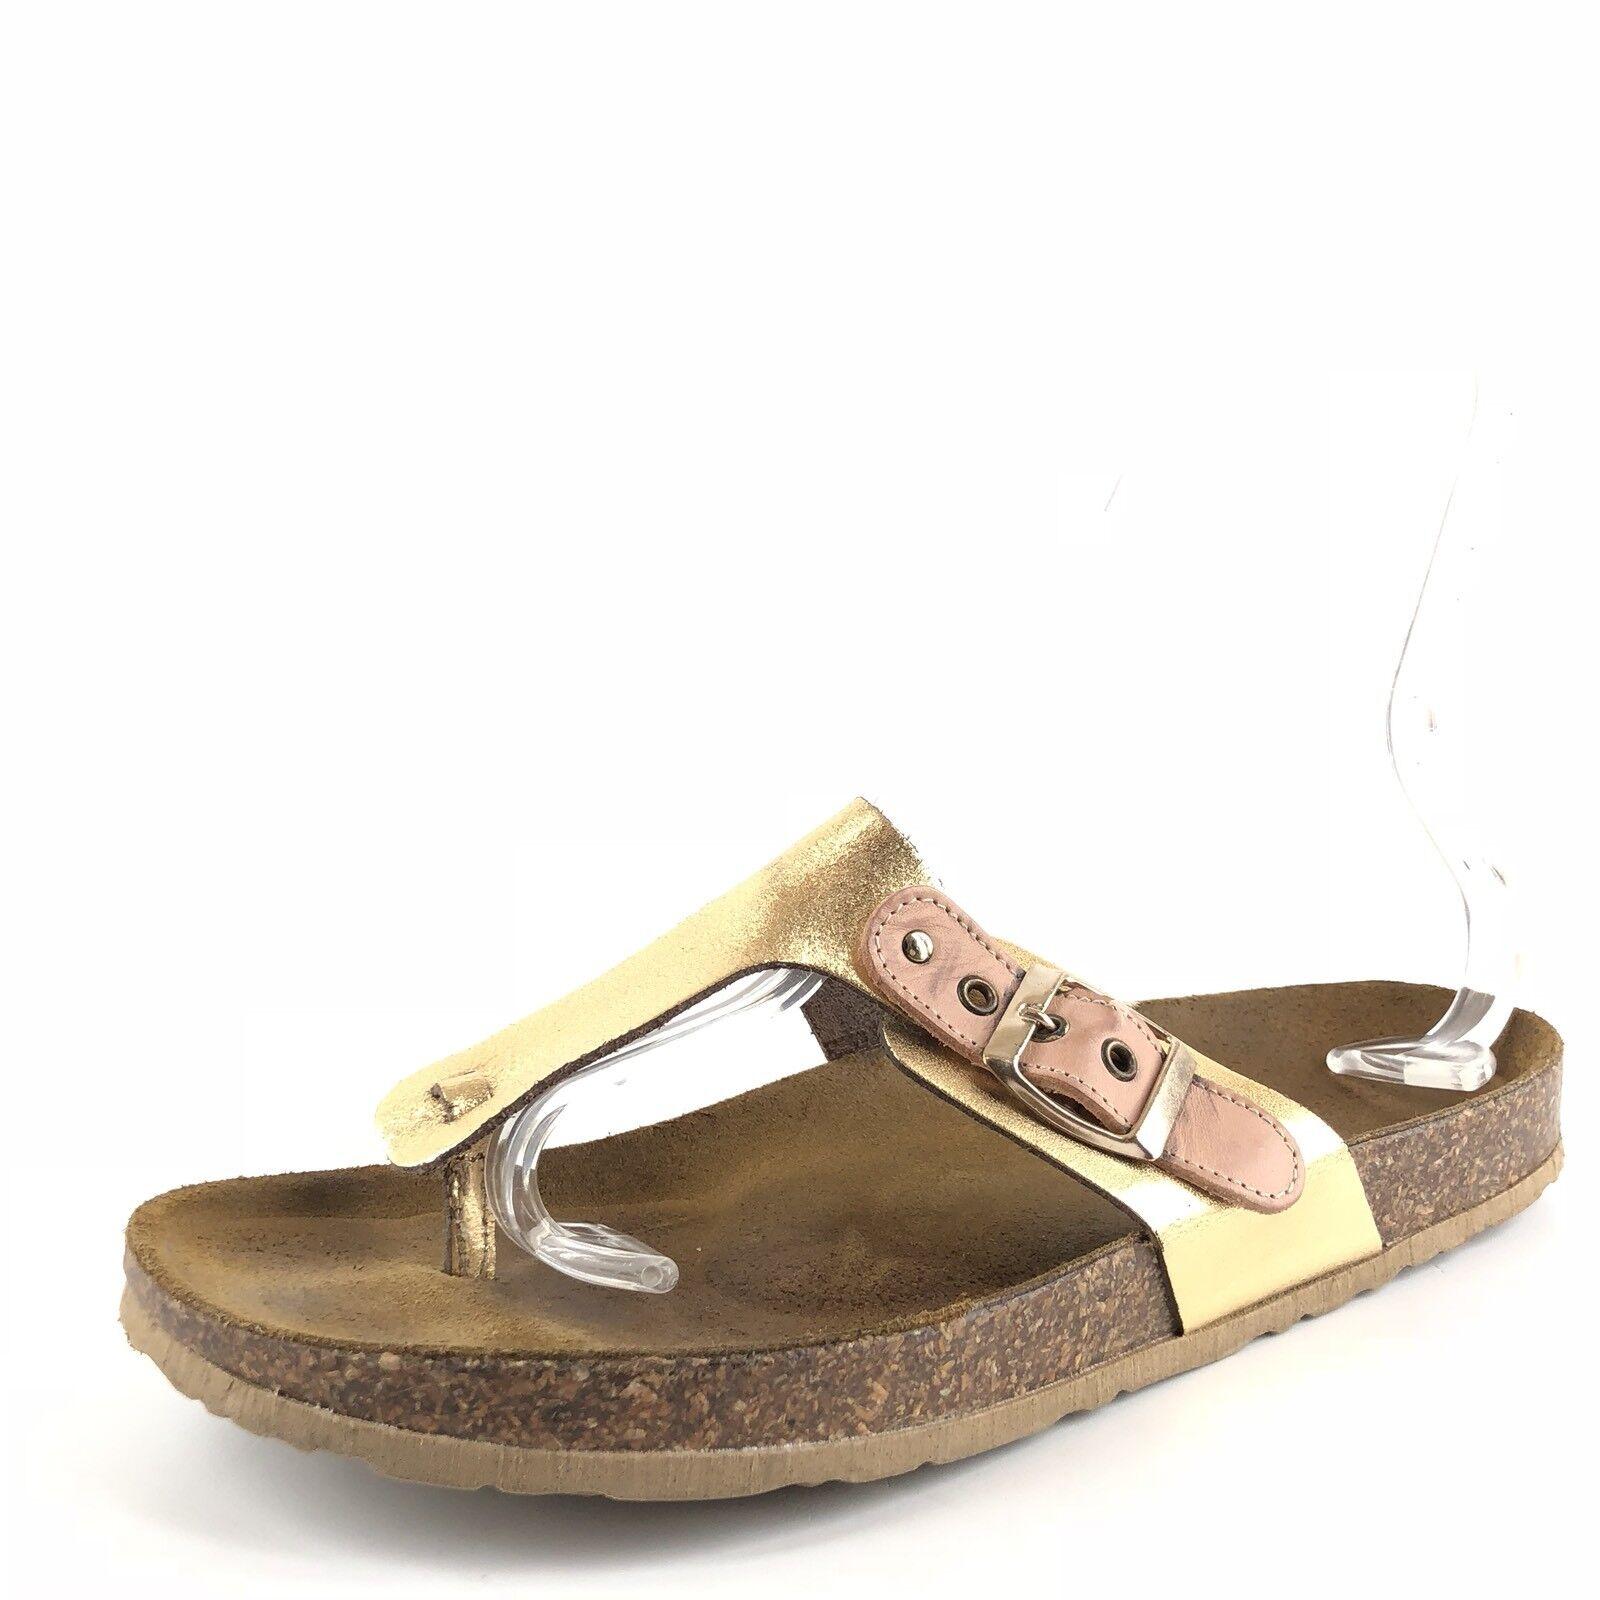 Seychelles calmar calmar calmar oro Cuero Sandalias para mujer Talla 11 M  punto de venta